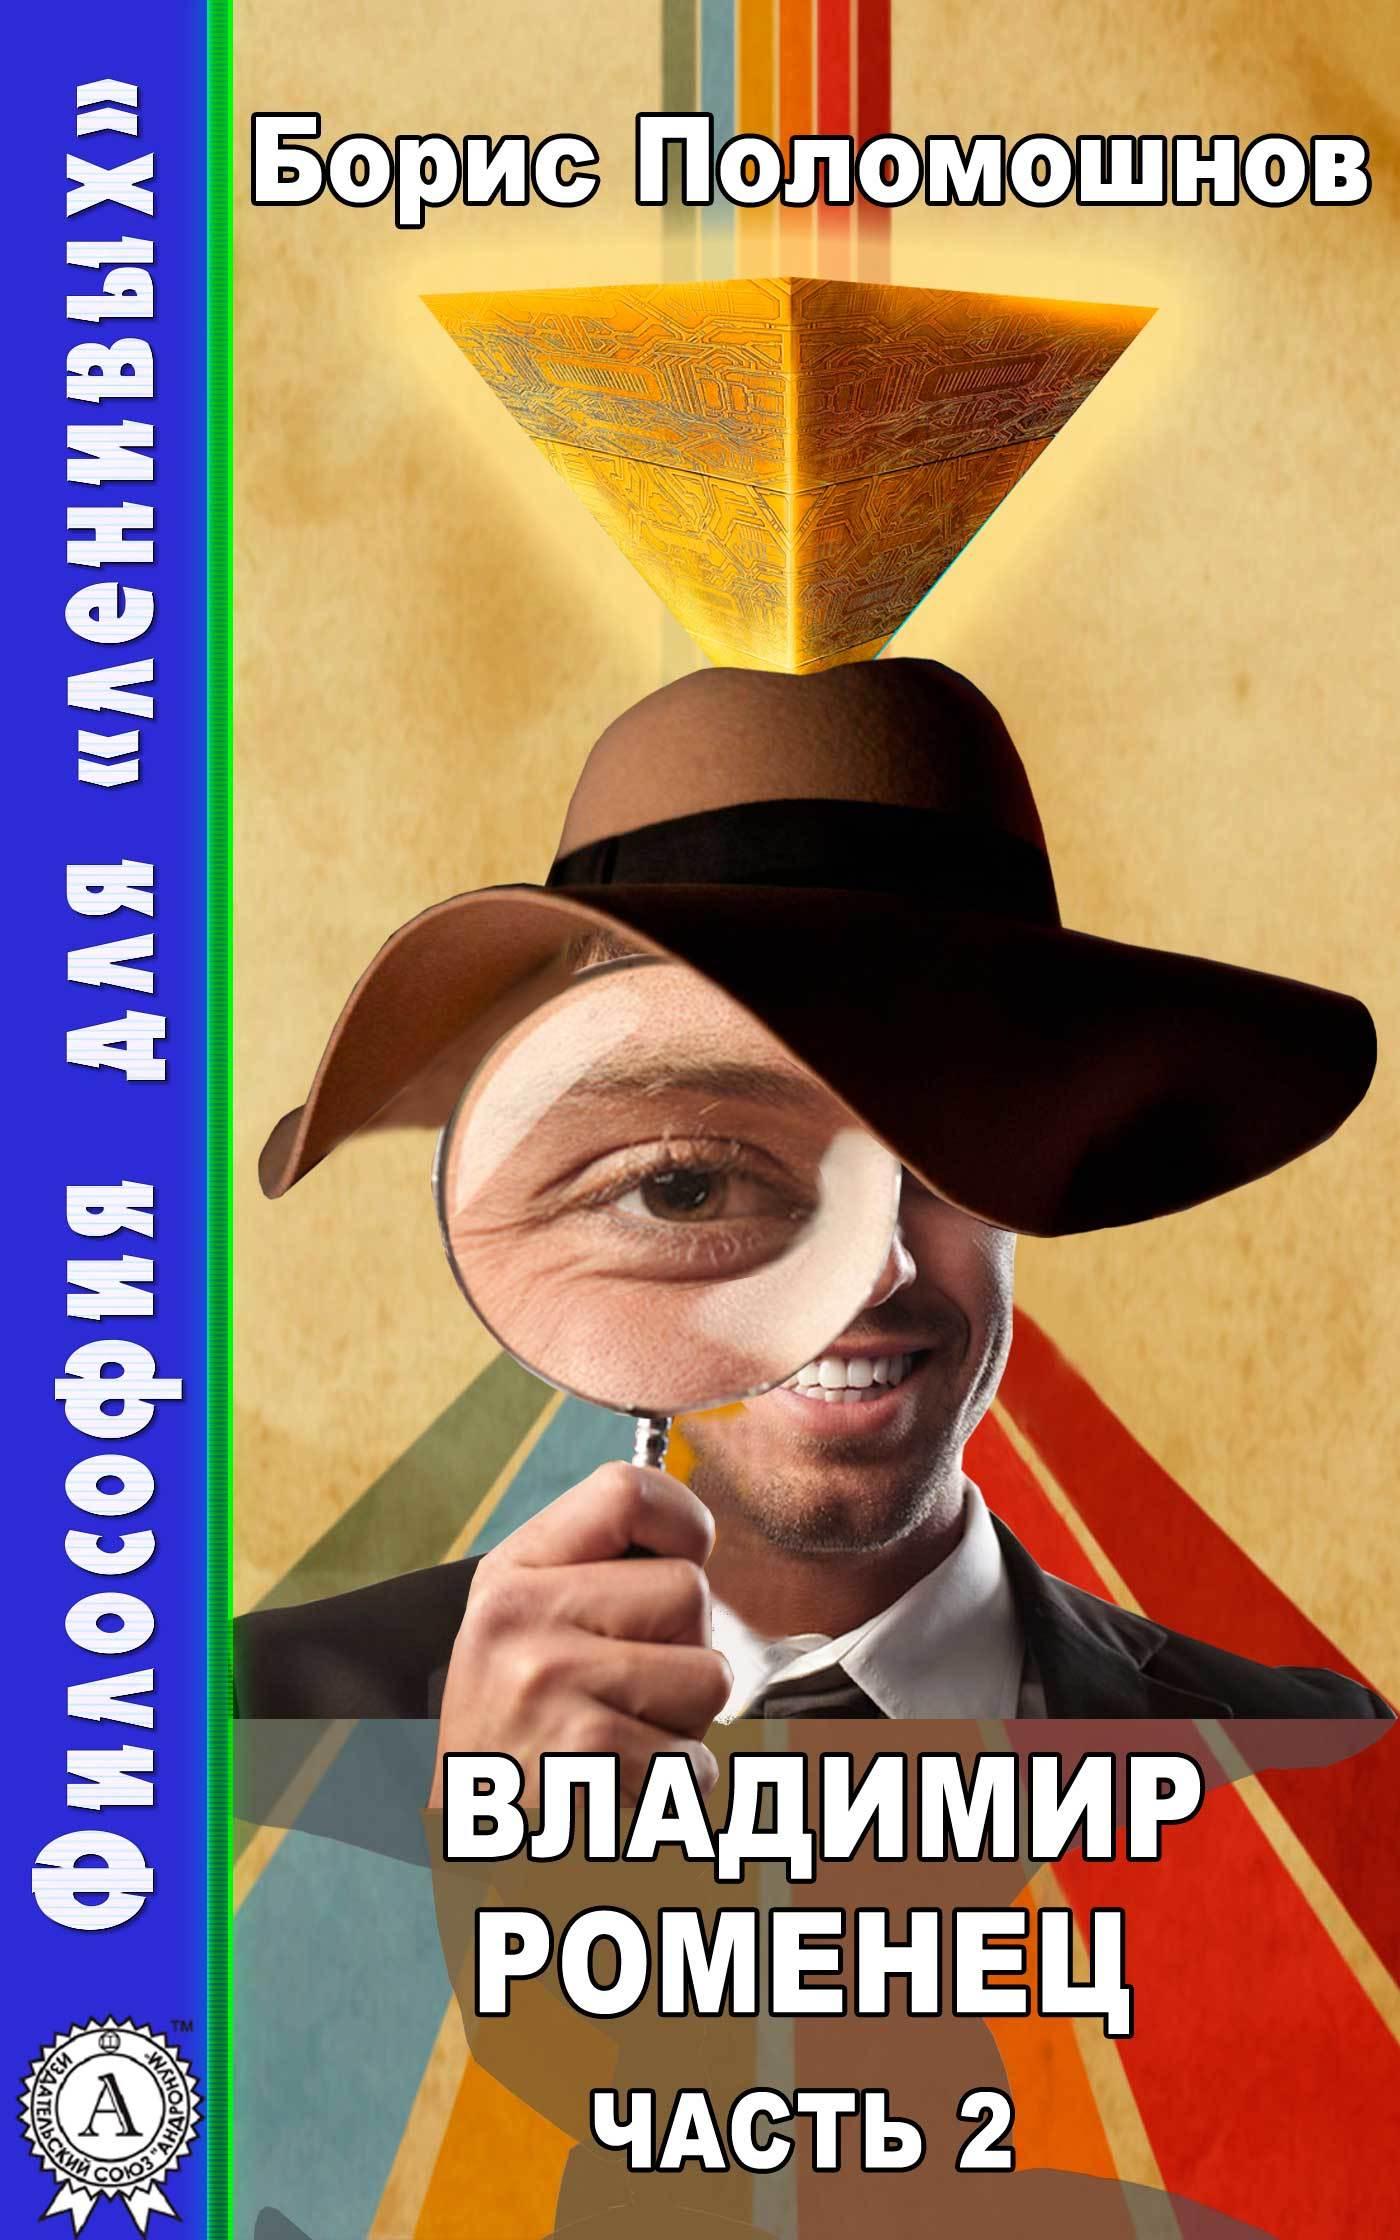 Борис Поломошнов Владимир Роменец. Часть 2